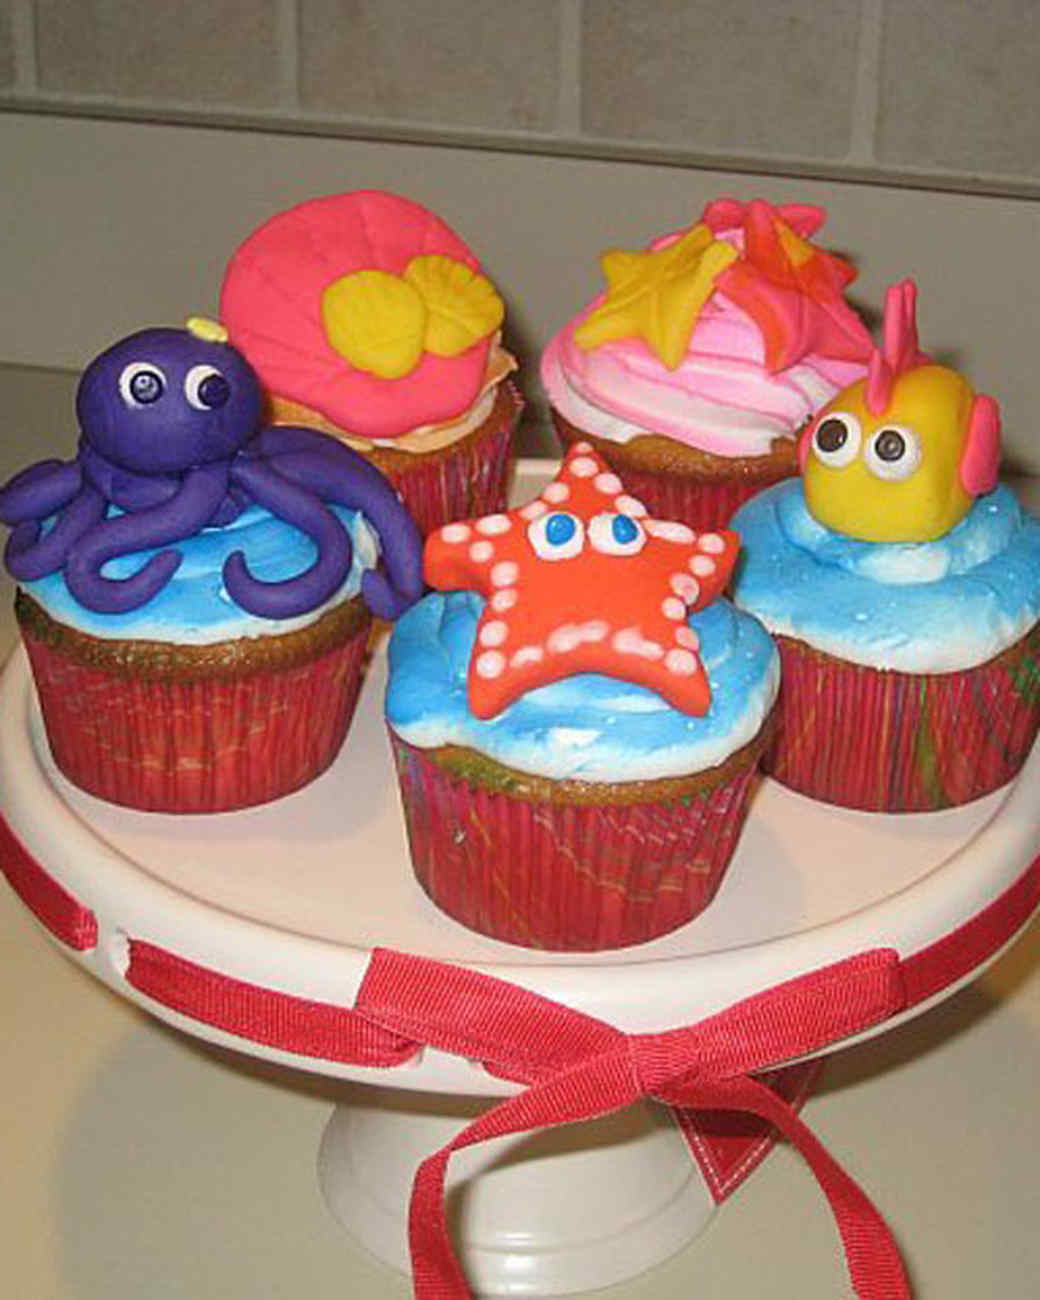 cupcake_contest_0211_ocean_cupcakes.jpg